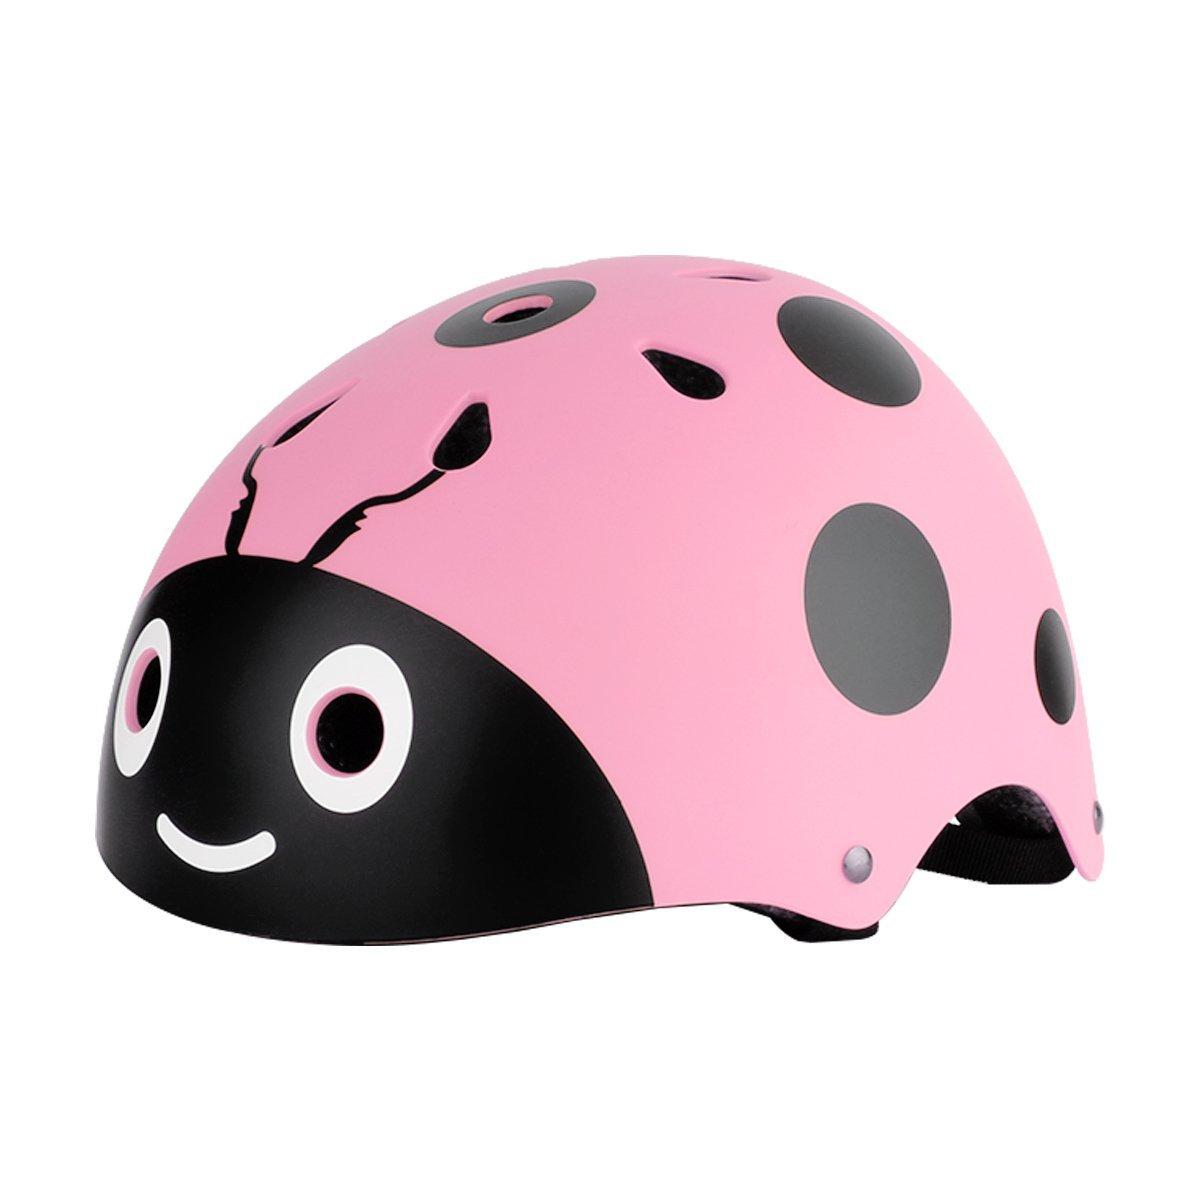 KIDS Bike Helmet,Adjustable Cute Ladybug Helmet for Safety Cycling Skateboarding Skating Skiing Snowboarding Scootering Durable Multi-sport